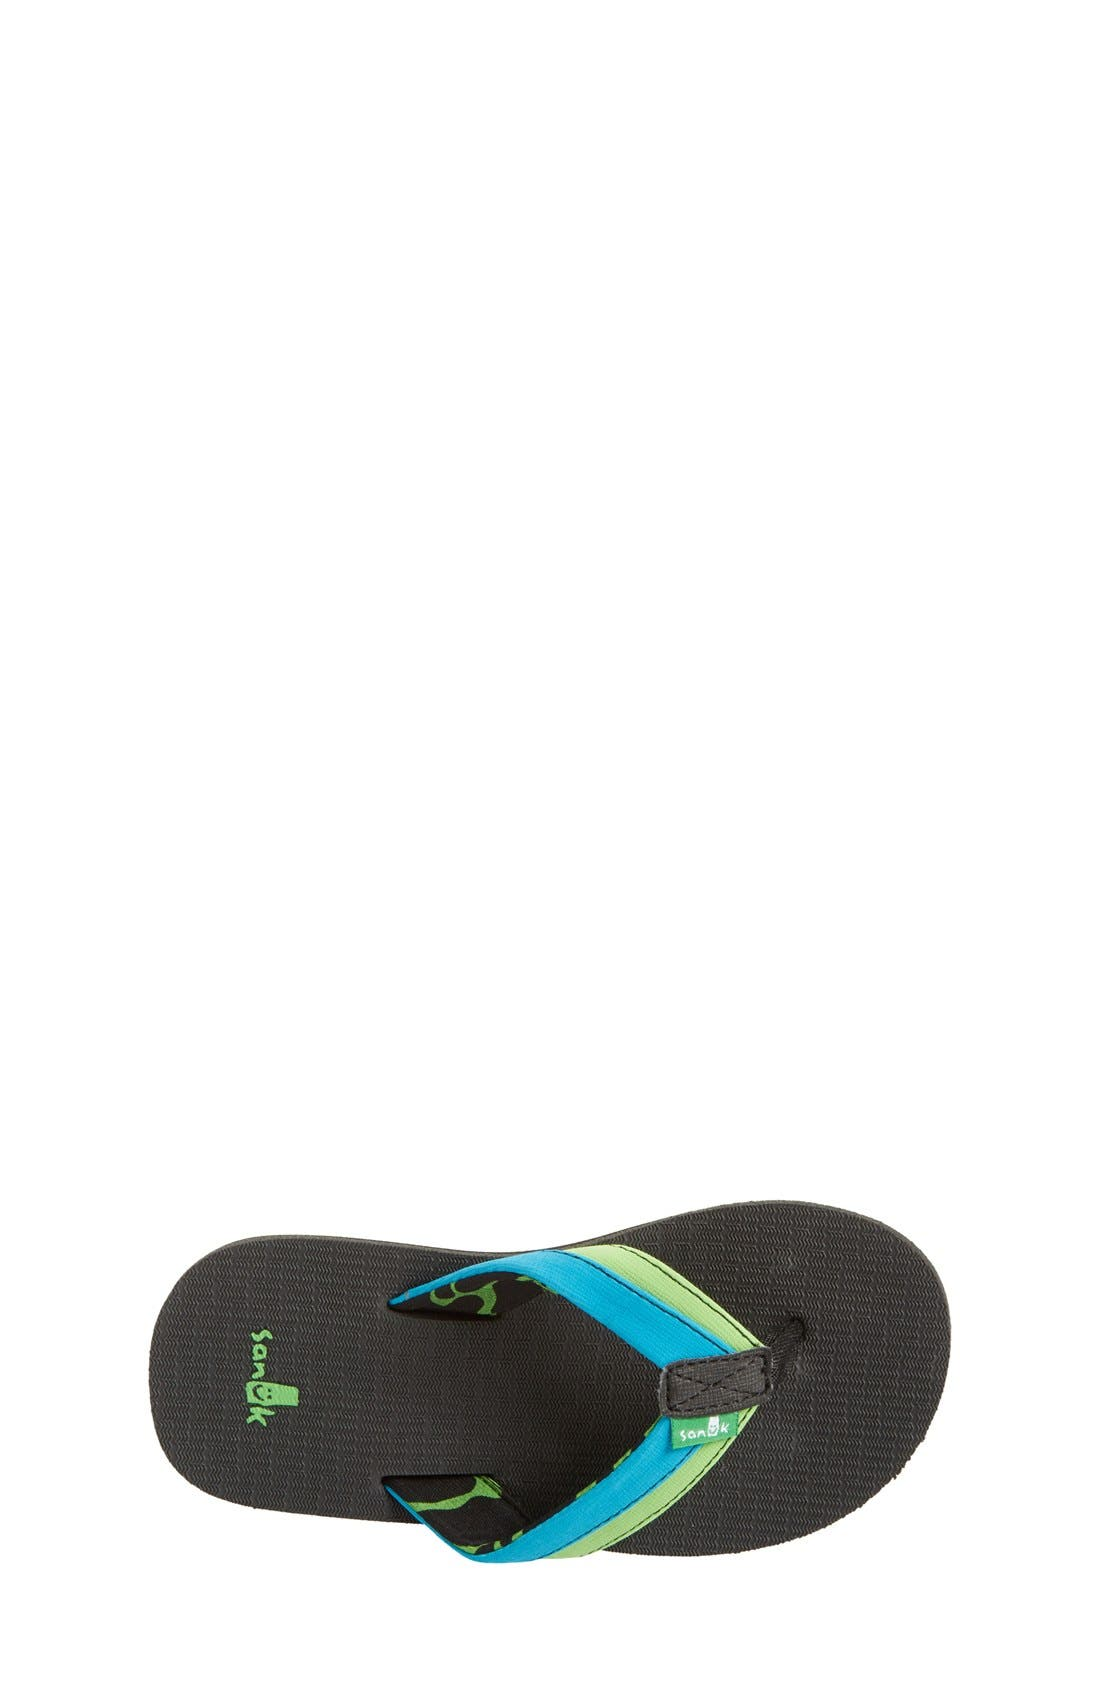 'Rootbeer Cozy' Lightweight Flip Flop Sandal,                             Alternate thumbnail 15, color,